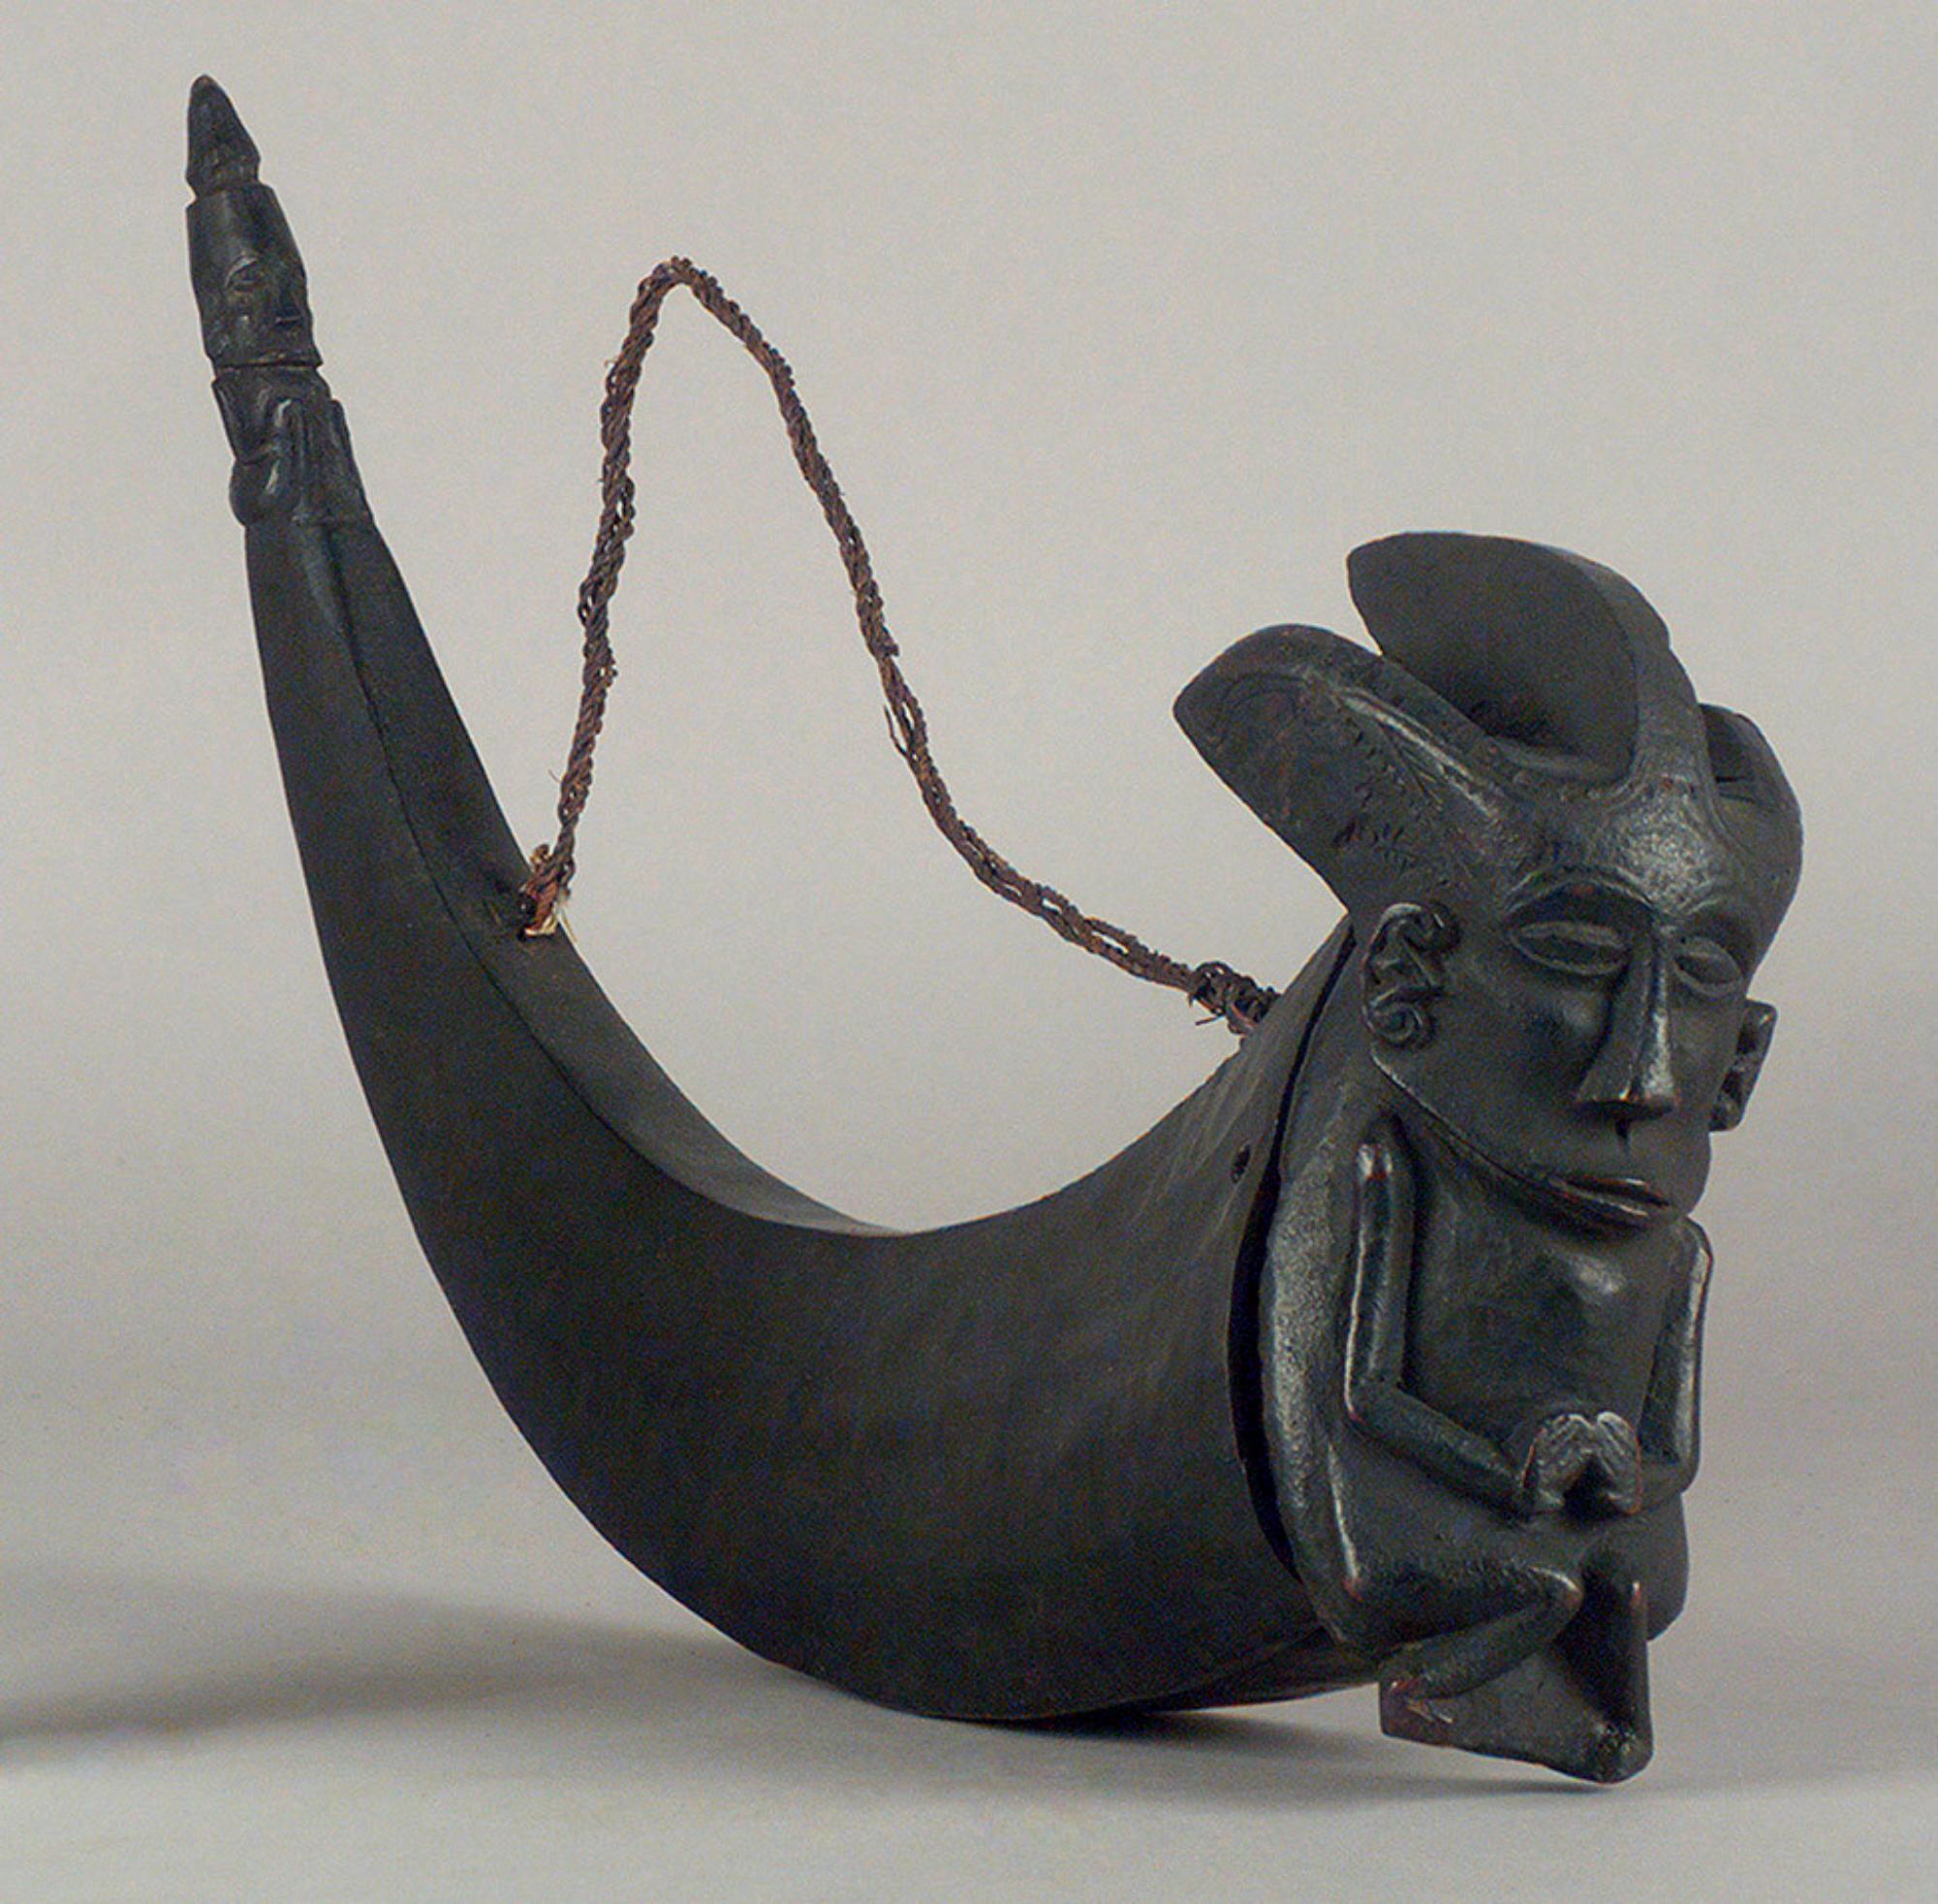 Batak Medicine Horn |  Naga Marsarang  | 19th Century © KHM-Museumsverband